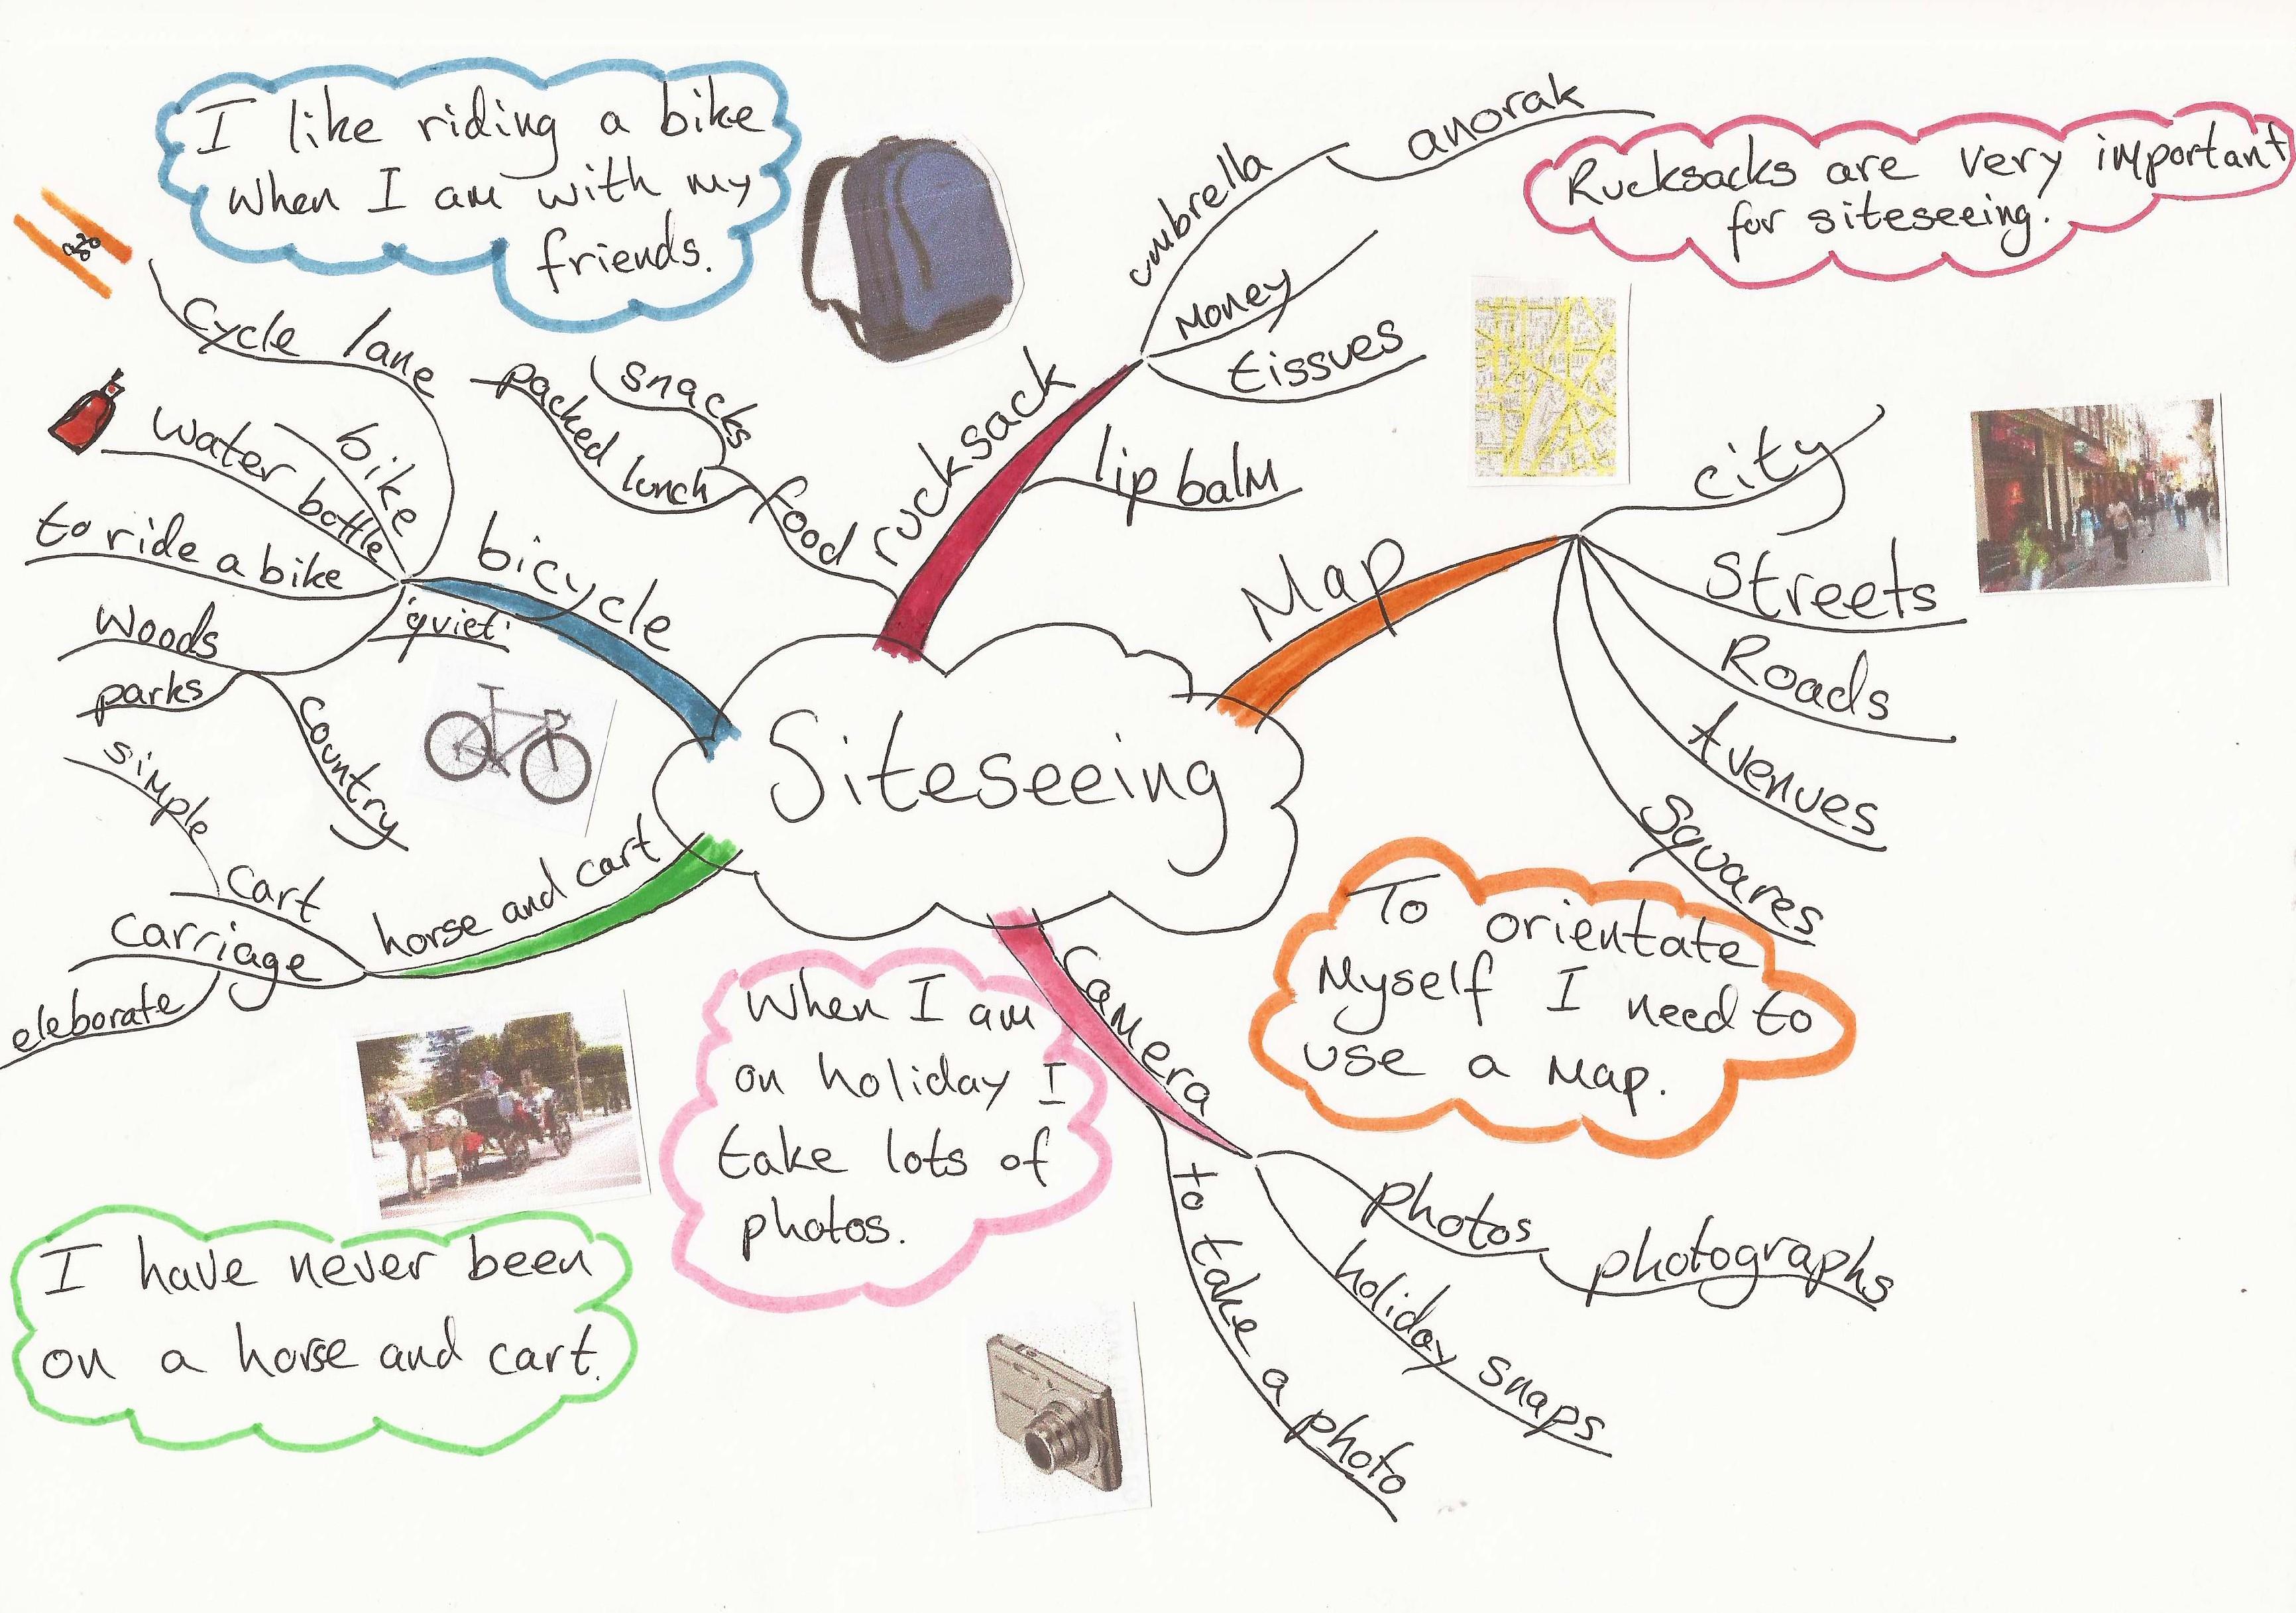 Sightseeing Mind Map